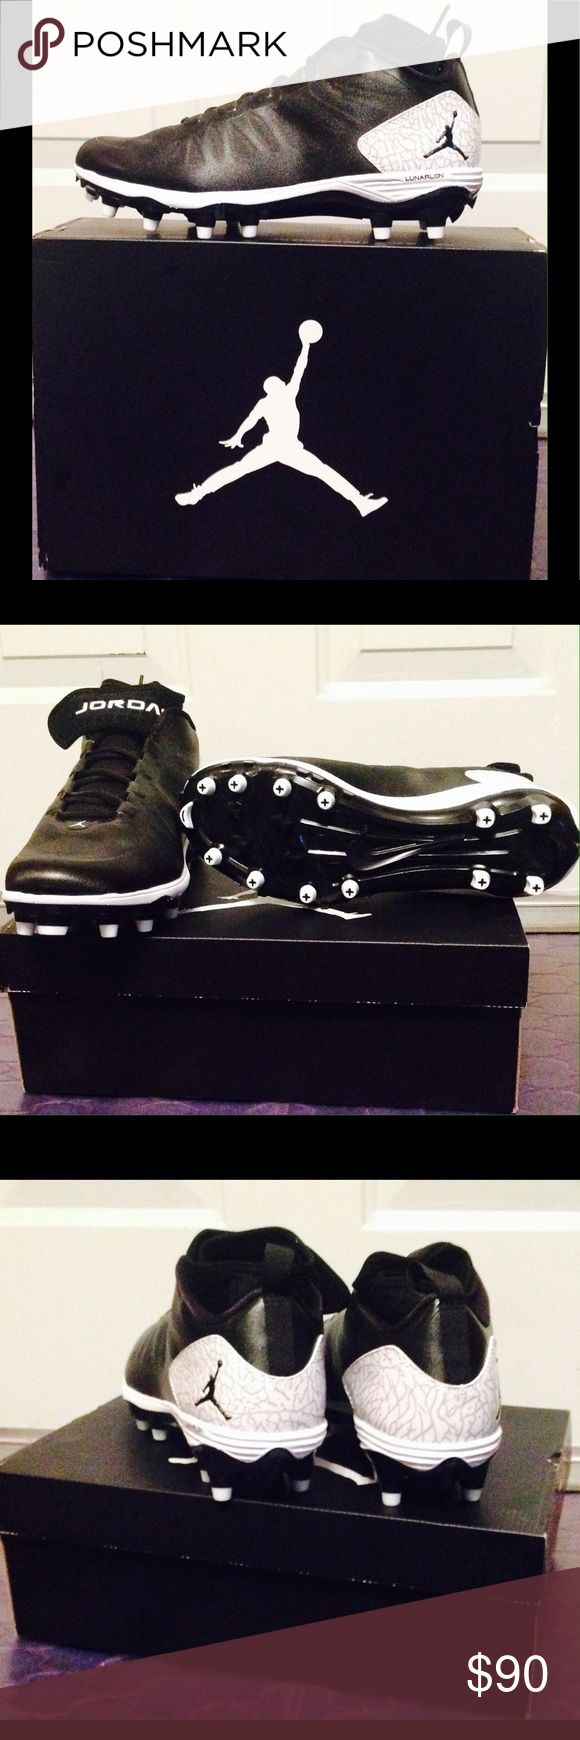 Nike Air Jordan Pro Dominate TD 2 Football Cleats Black Jordan football cleats. This item has never been worn. Brand new in its original box. Air Jordan Shoes Athletic Shoes